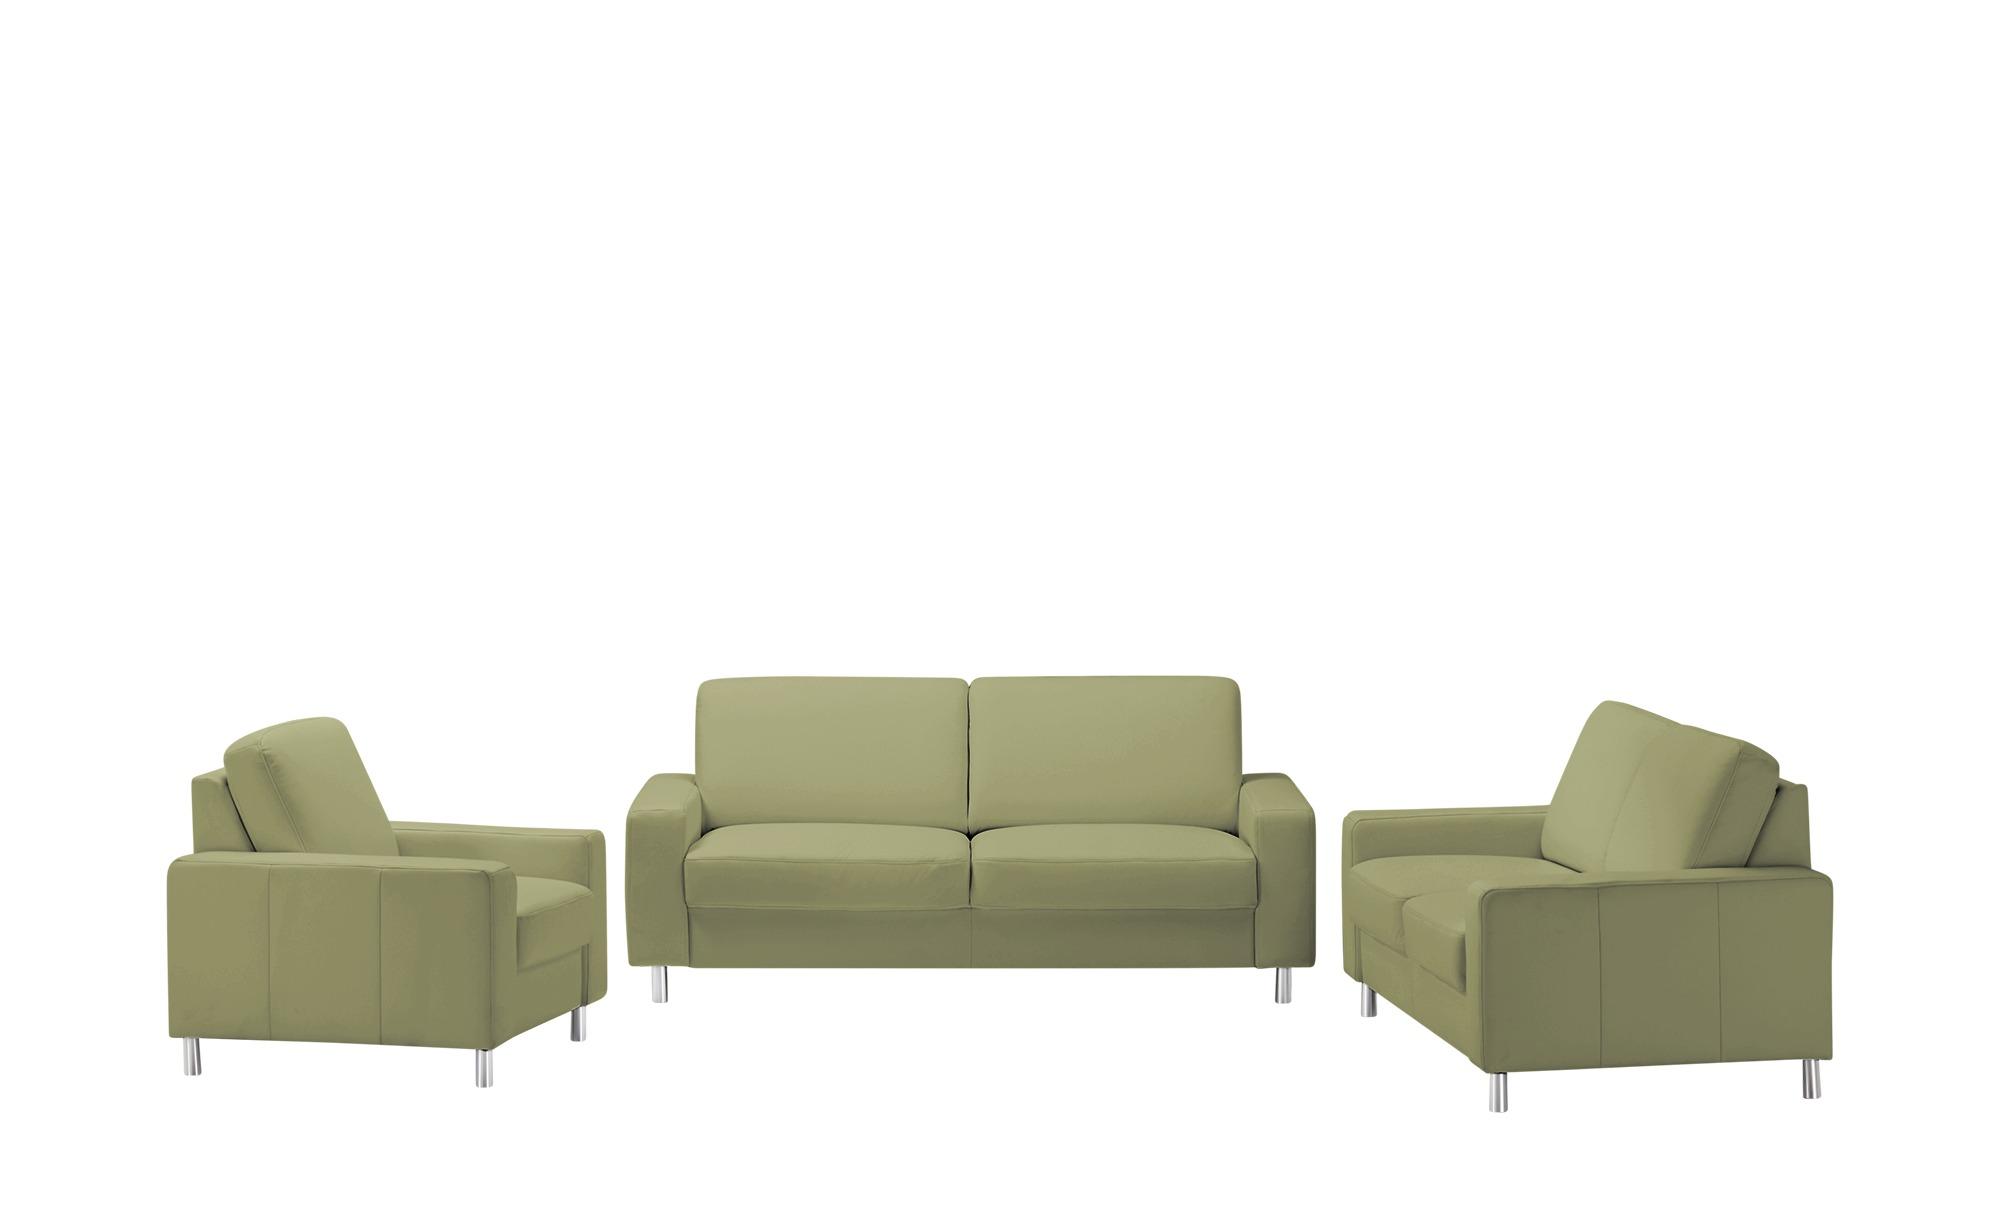 meinSofa Sitzgruppe  Byron ¦ grün Polstermöbel > Sofas > Sitzgruppen - Höffner